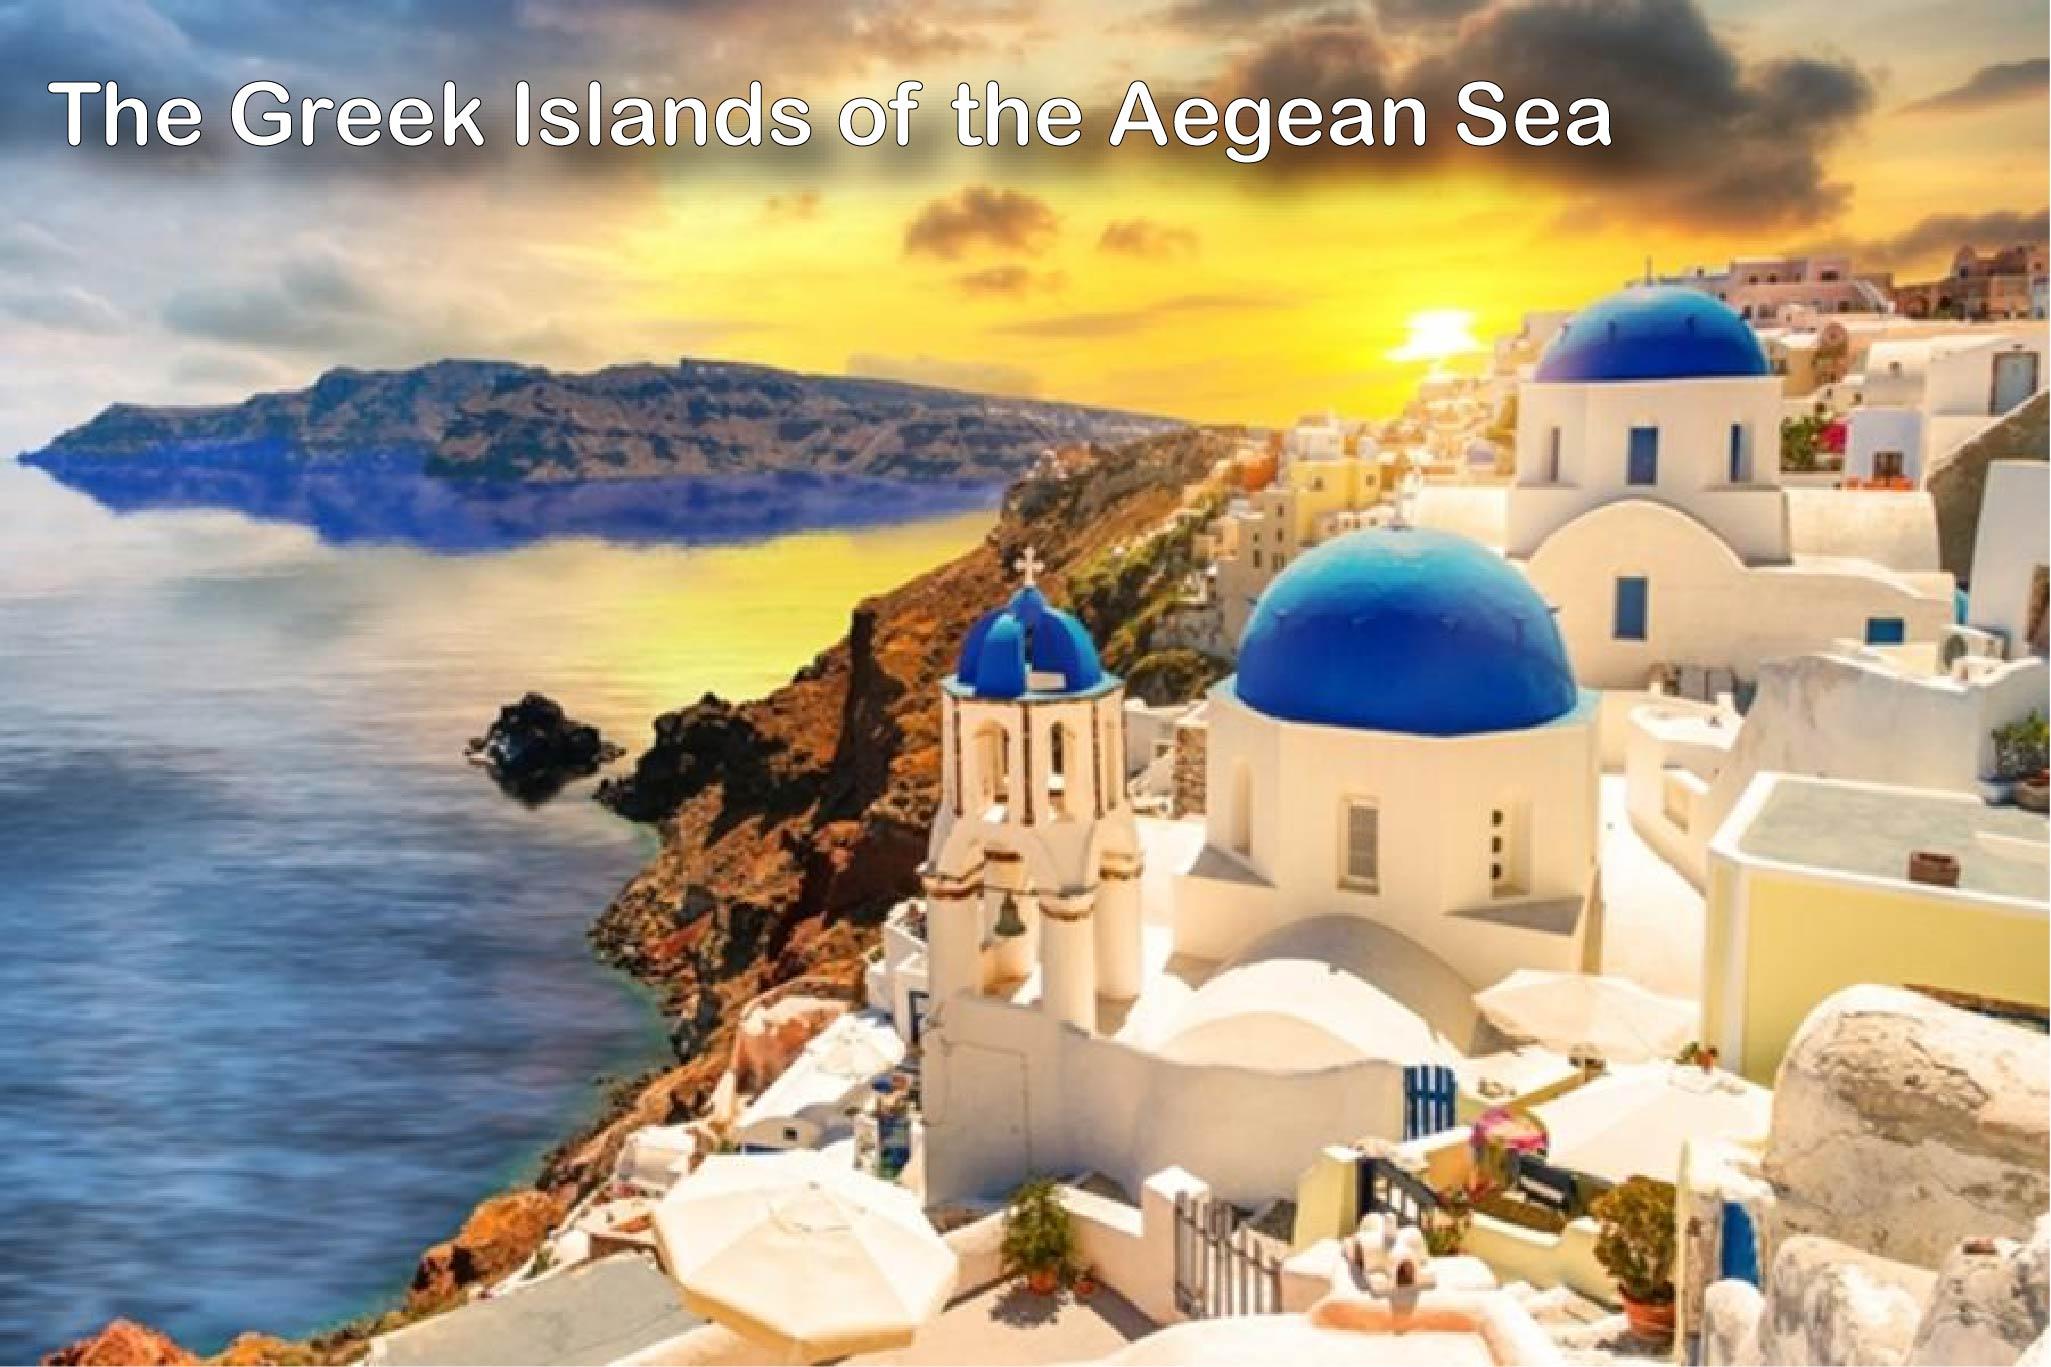 2019 UAA10 The Greek Islands of the Aegean Sea 10 days